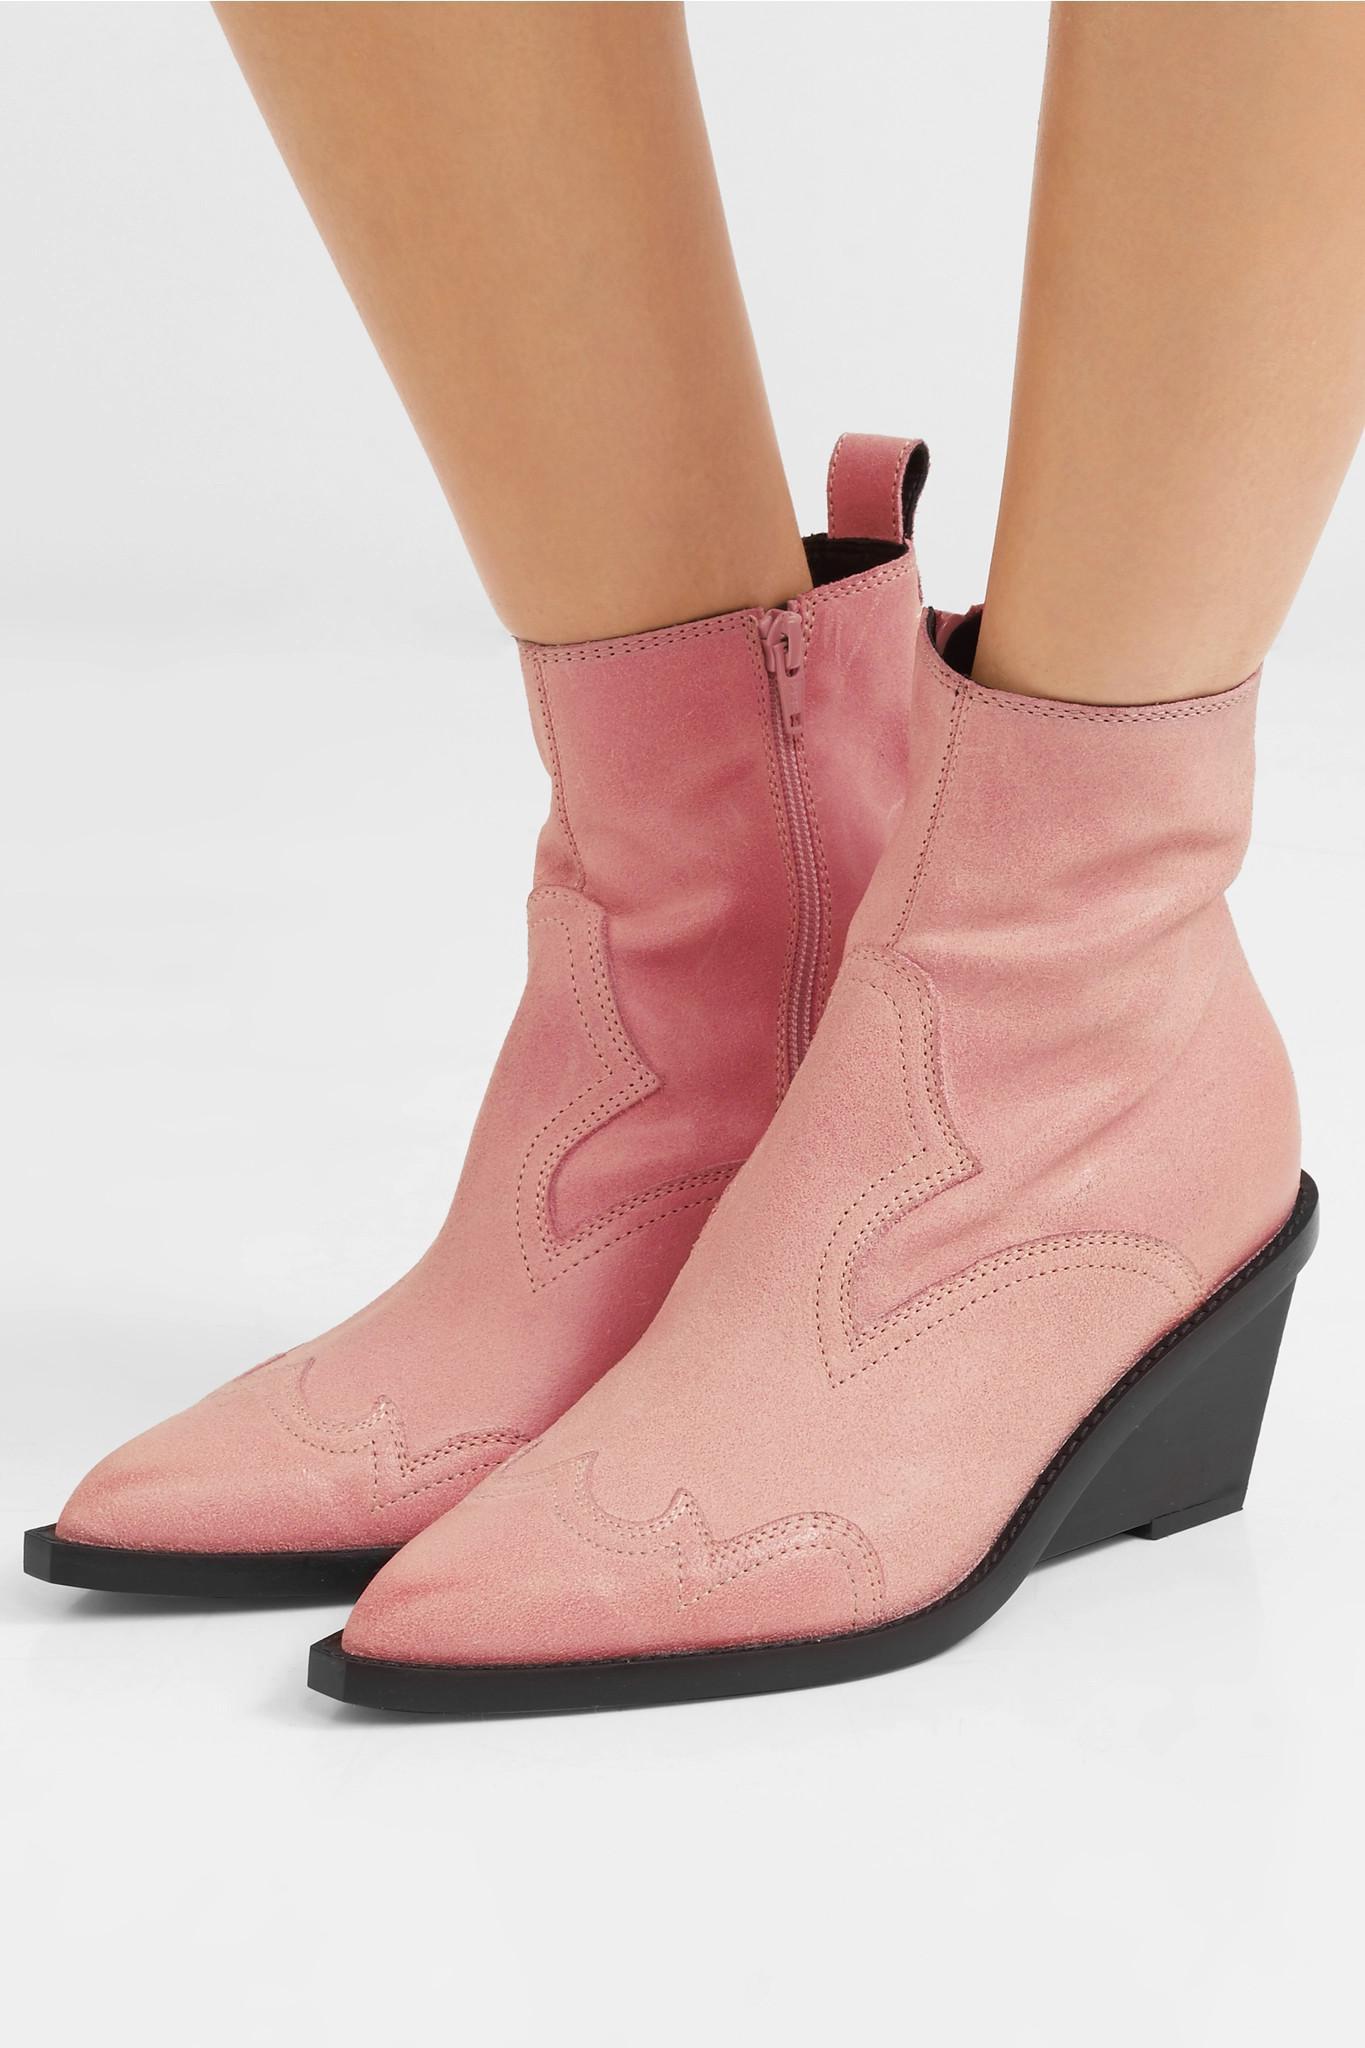 ece7b5c54d13 MM6 by Maison Martin Margiela - Pink Nubuck Wedge Ankle Boots - Lyst. View  fullscreen